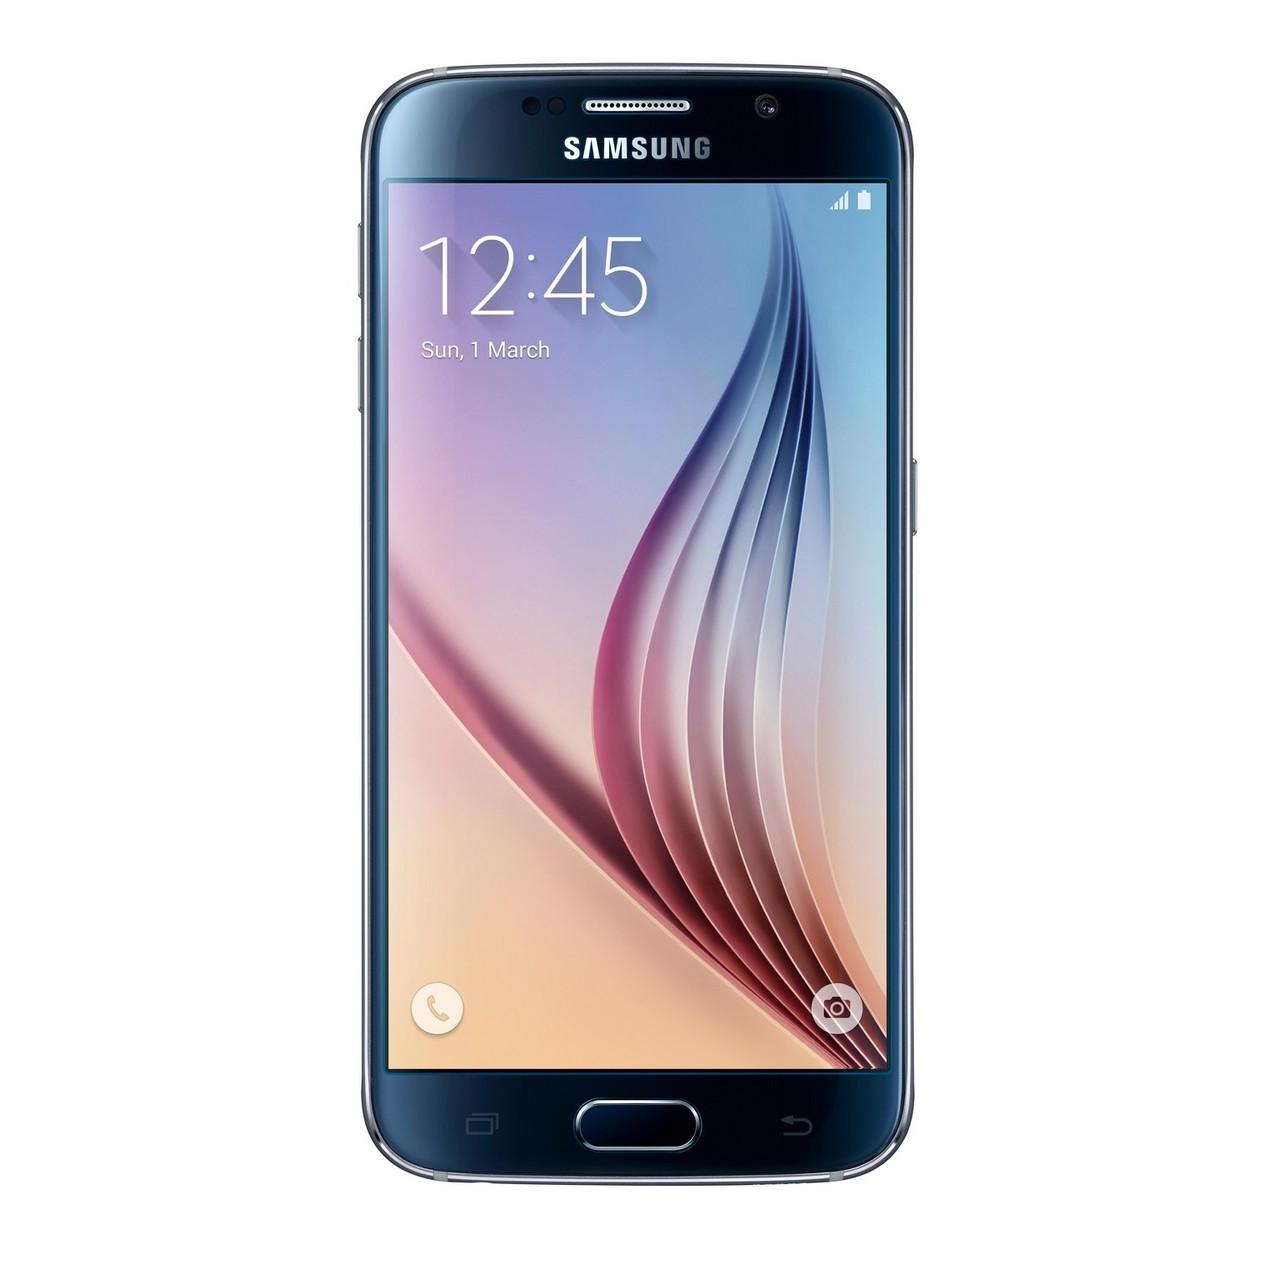 Смартфон Samsung G920F Galaxy S6 32GB (Black Sapphire)